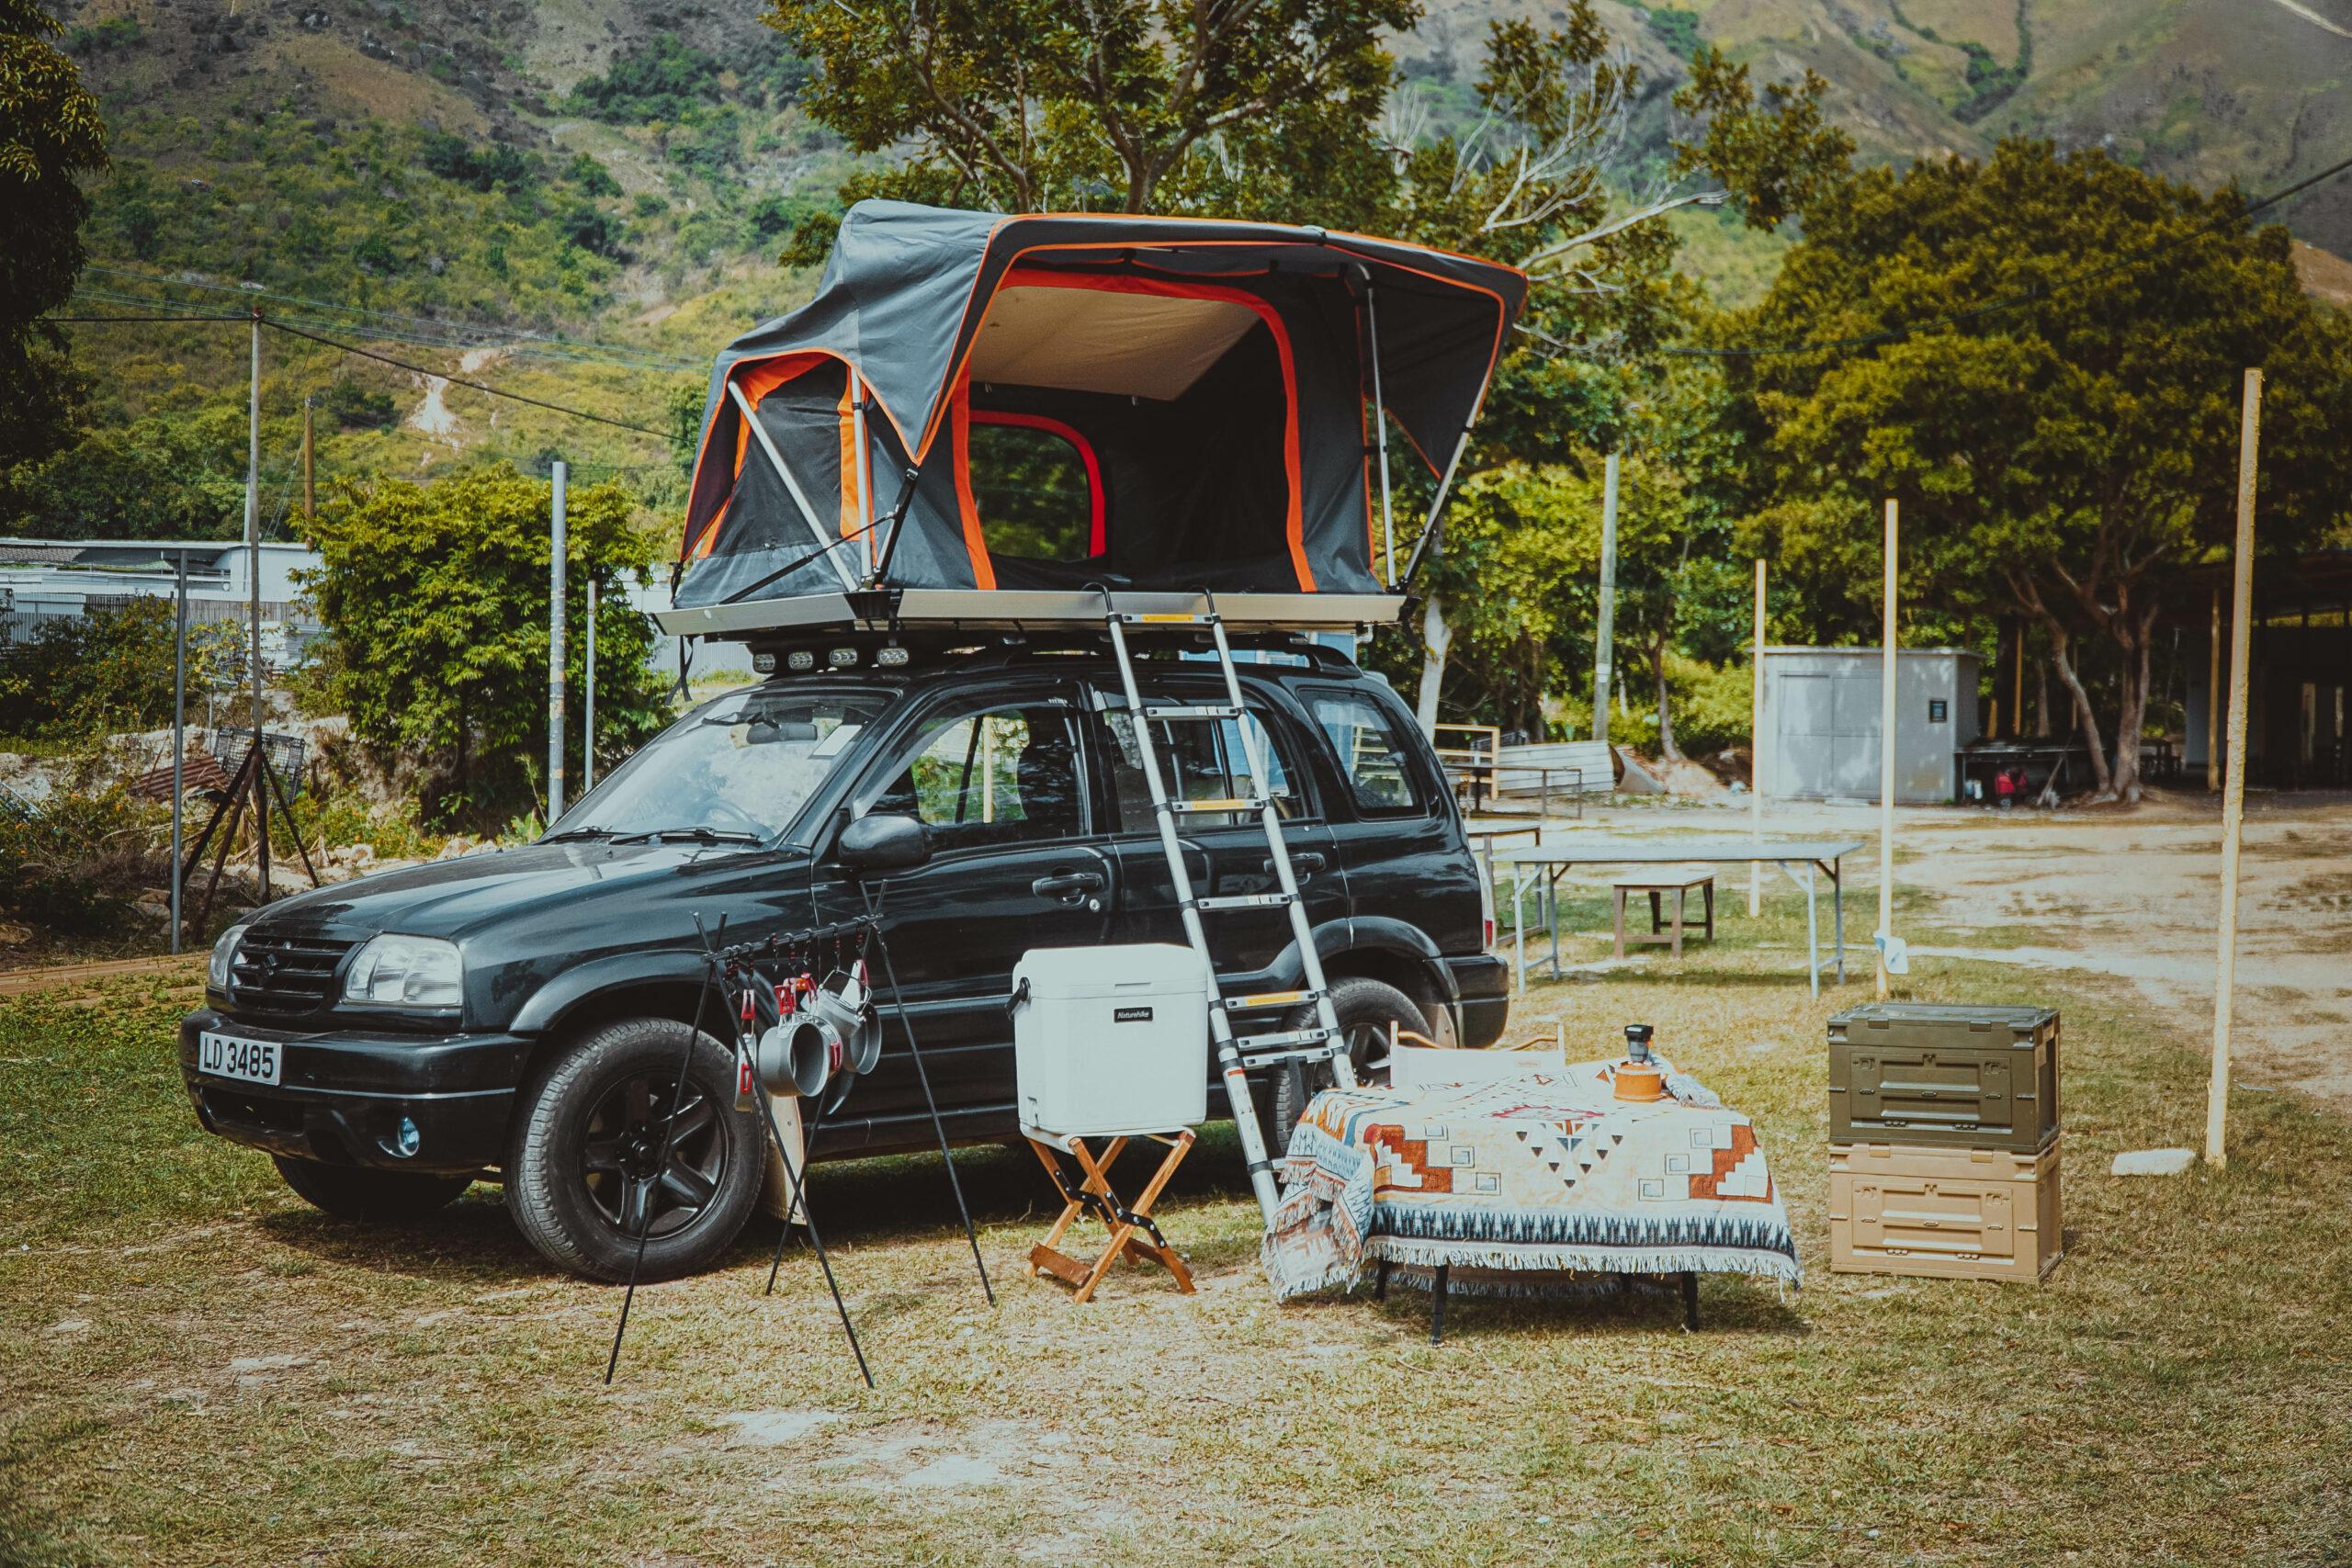 A Zone 專屬汽⾞露營營區